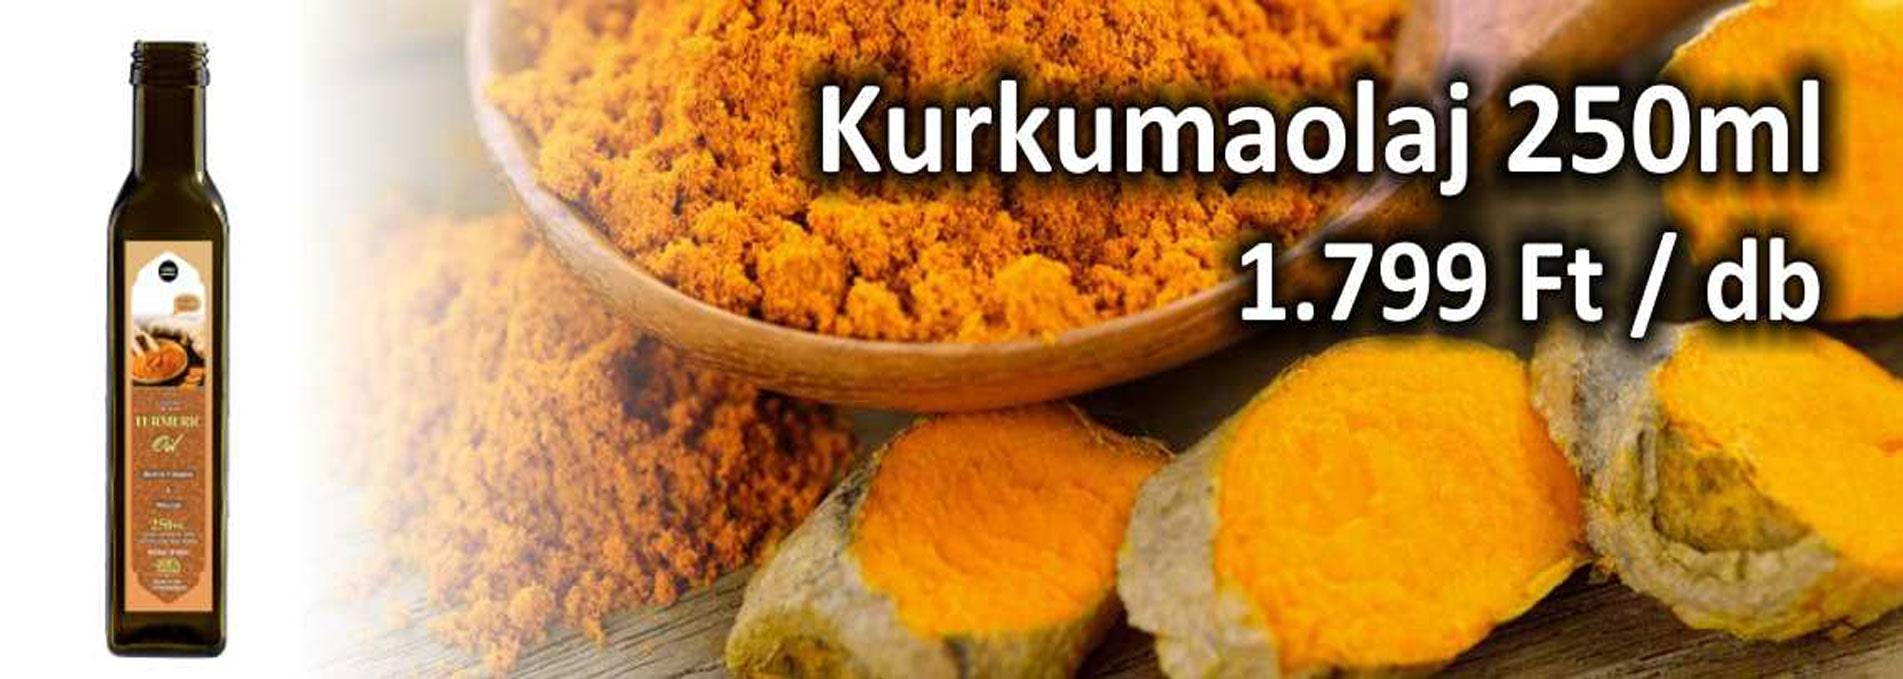 Kurkumaolaj